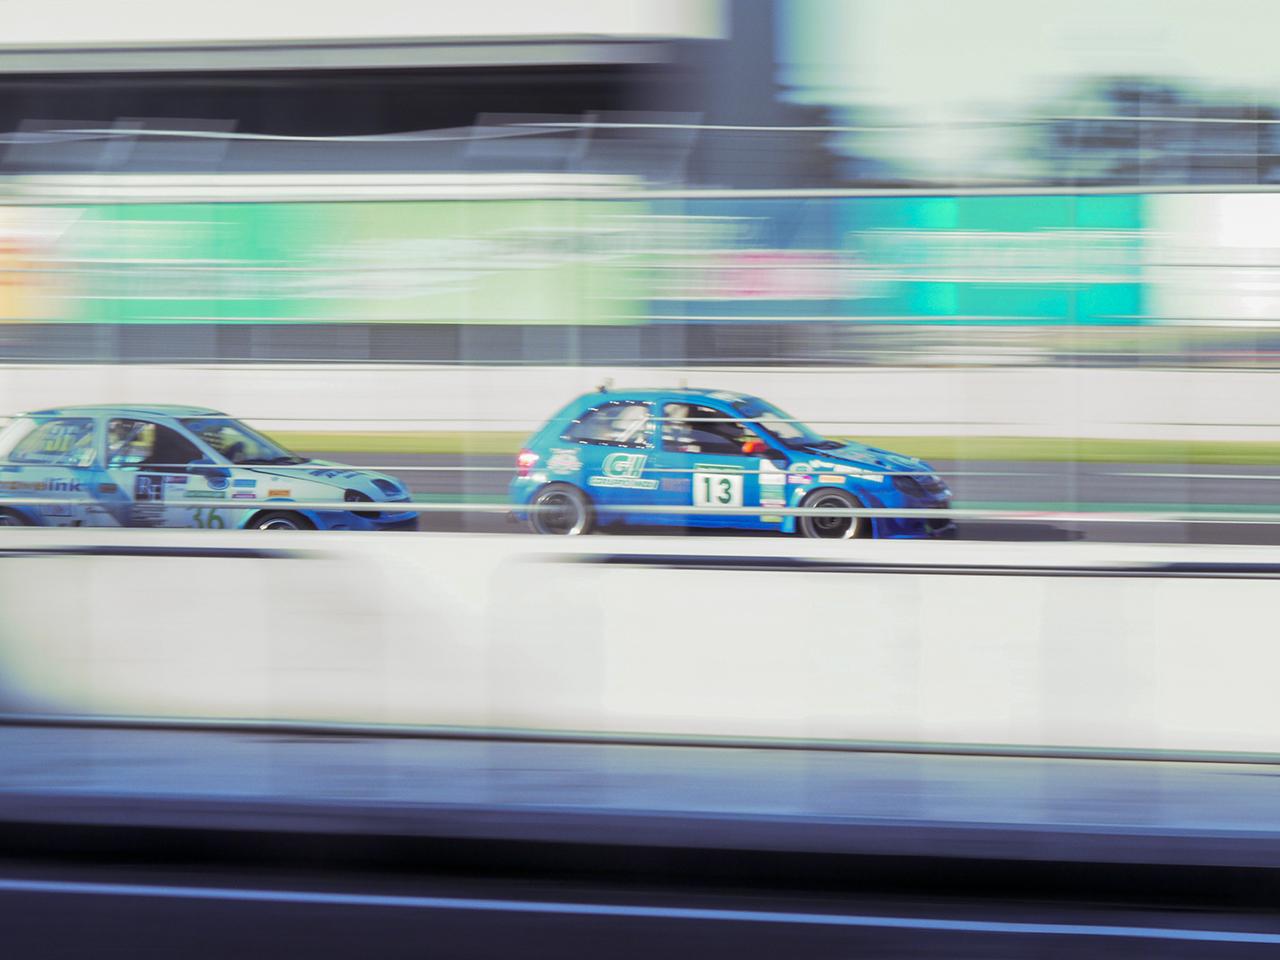 De Rivas battles another racer down the main straight.